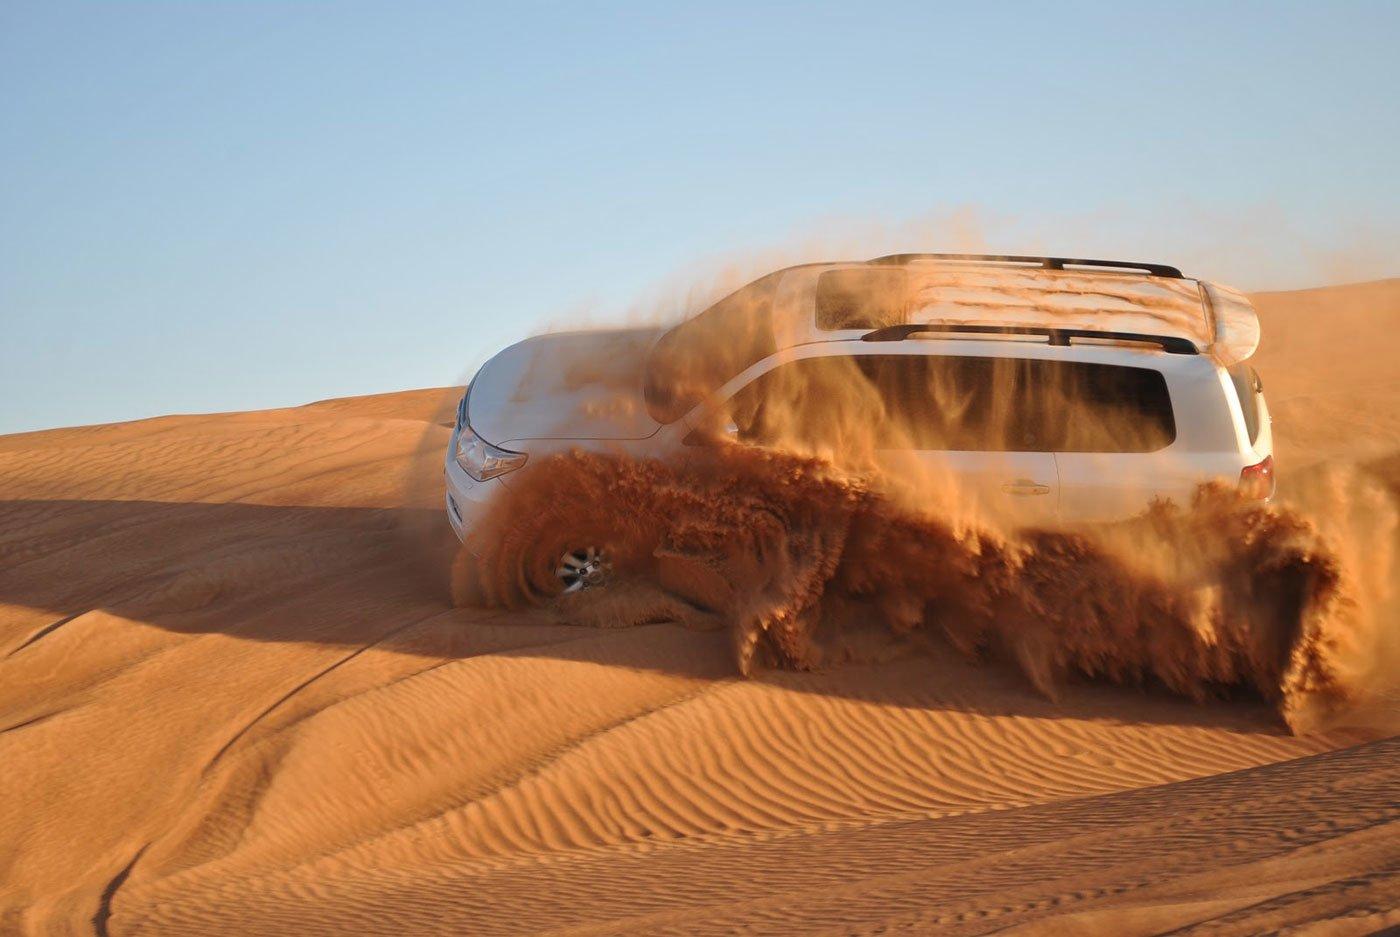 Desert Safari with Dinner & Live Entertainments - Tour